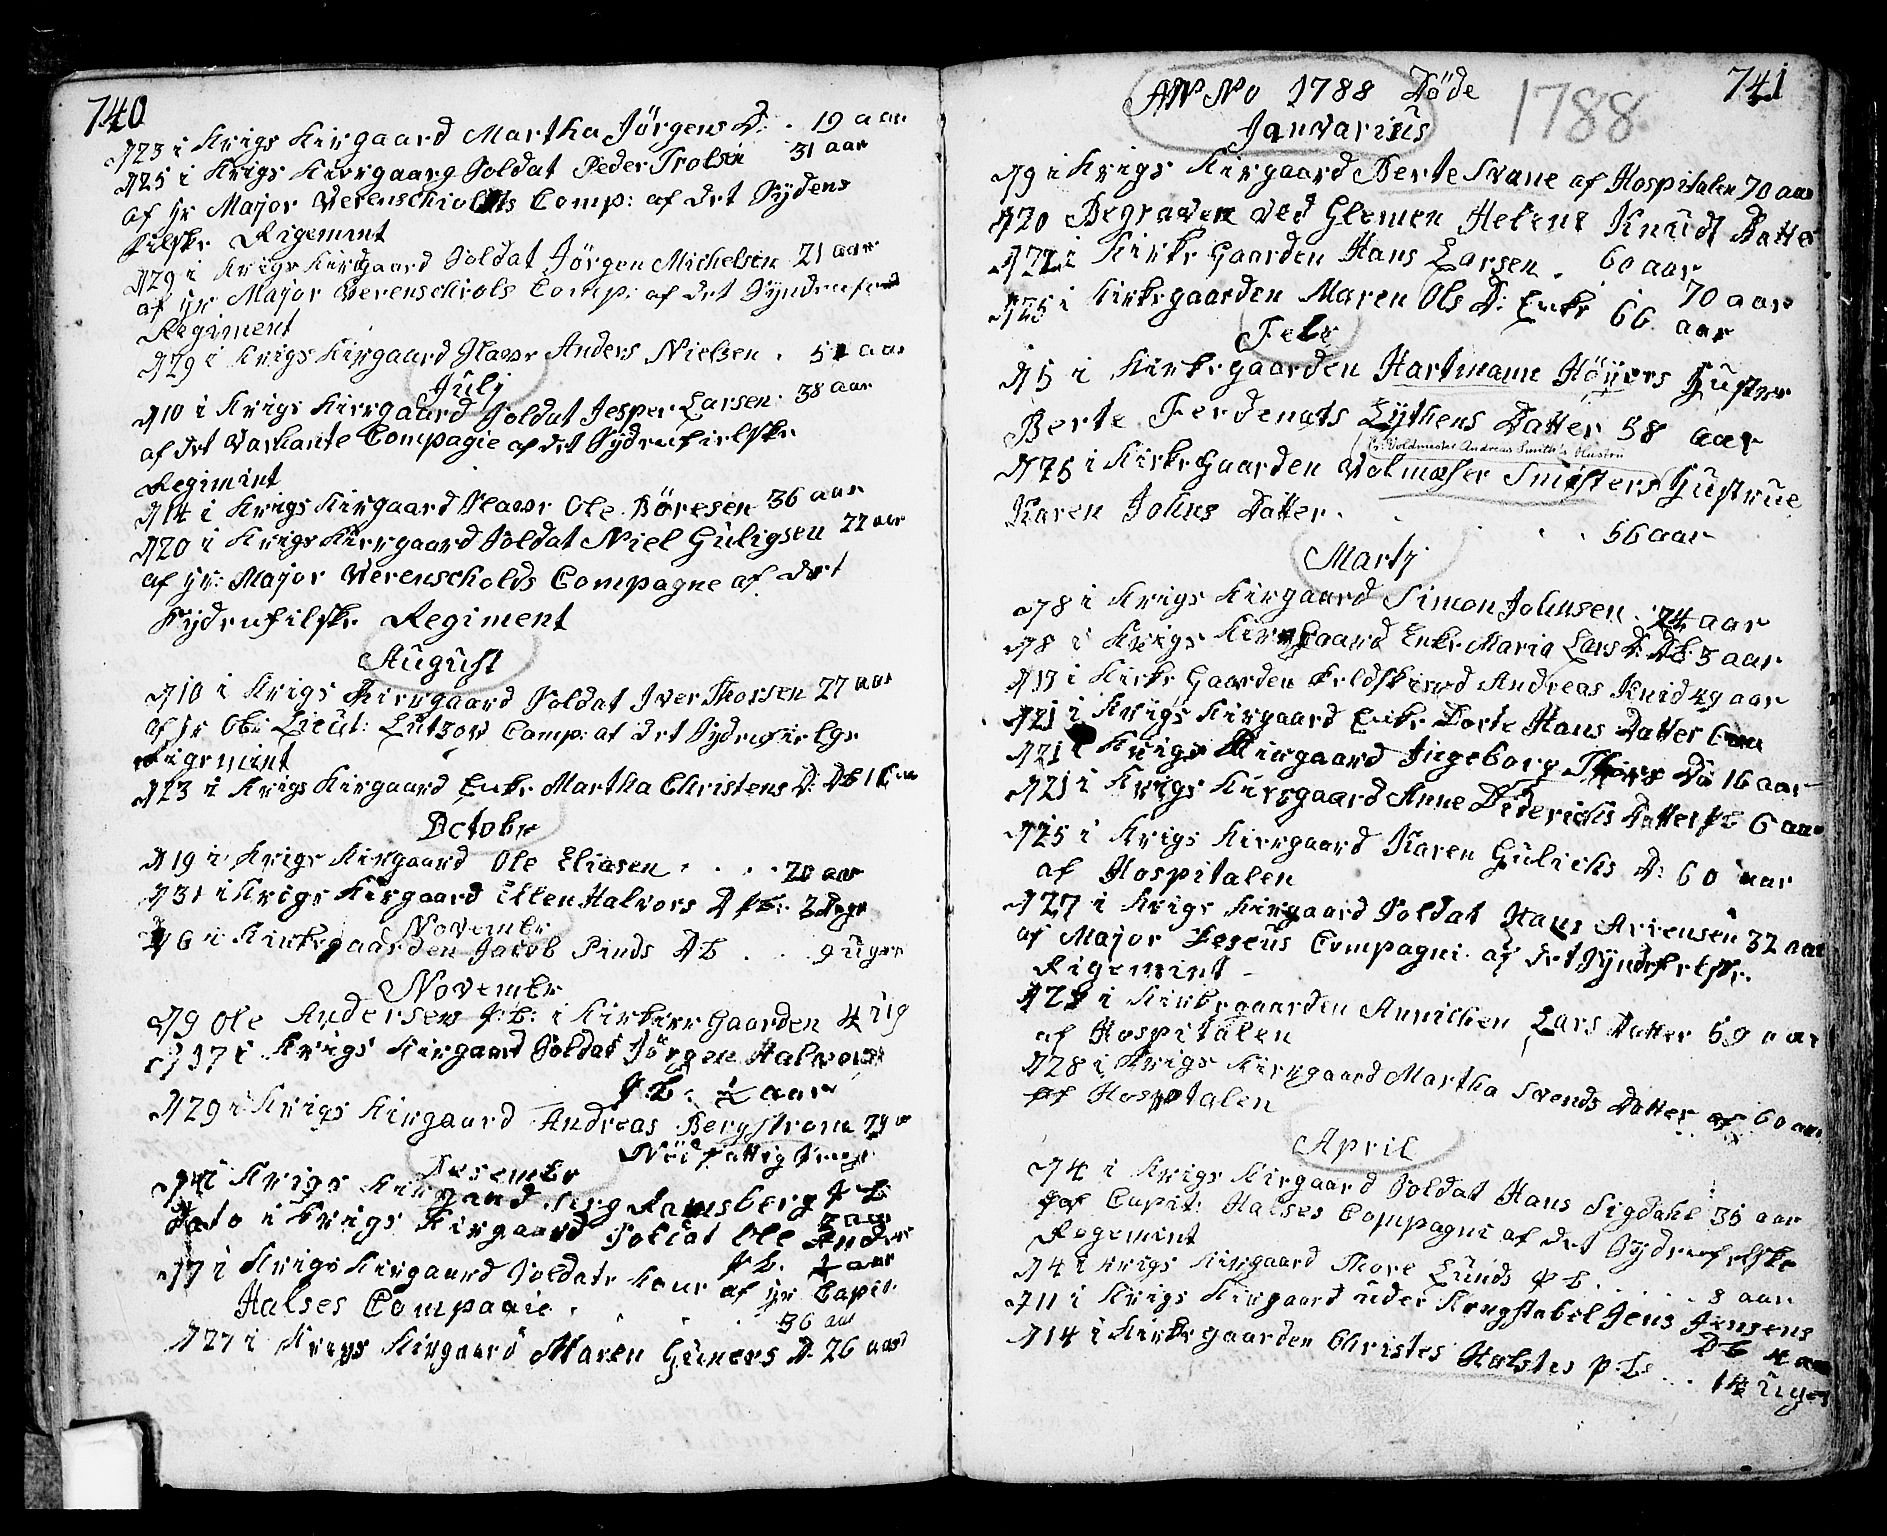 SAO, Fredrikstad prestekontor Kirkebøker, F/Fa/L0002: Ministerialbok nr. 2, 1750-1804, s. 740-741